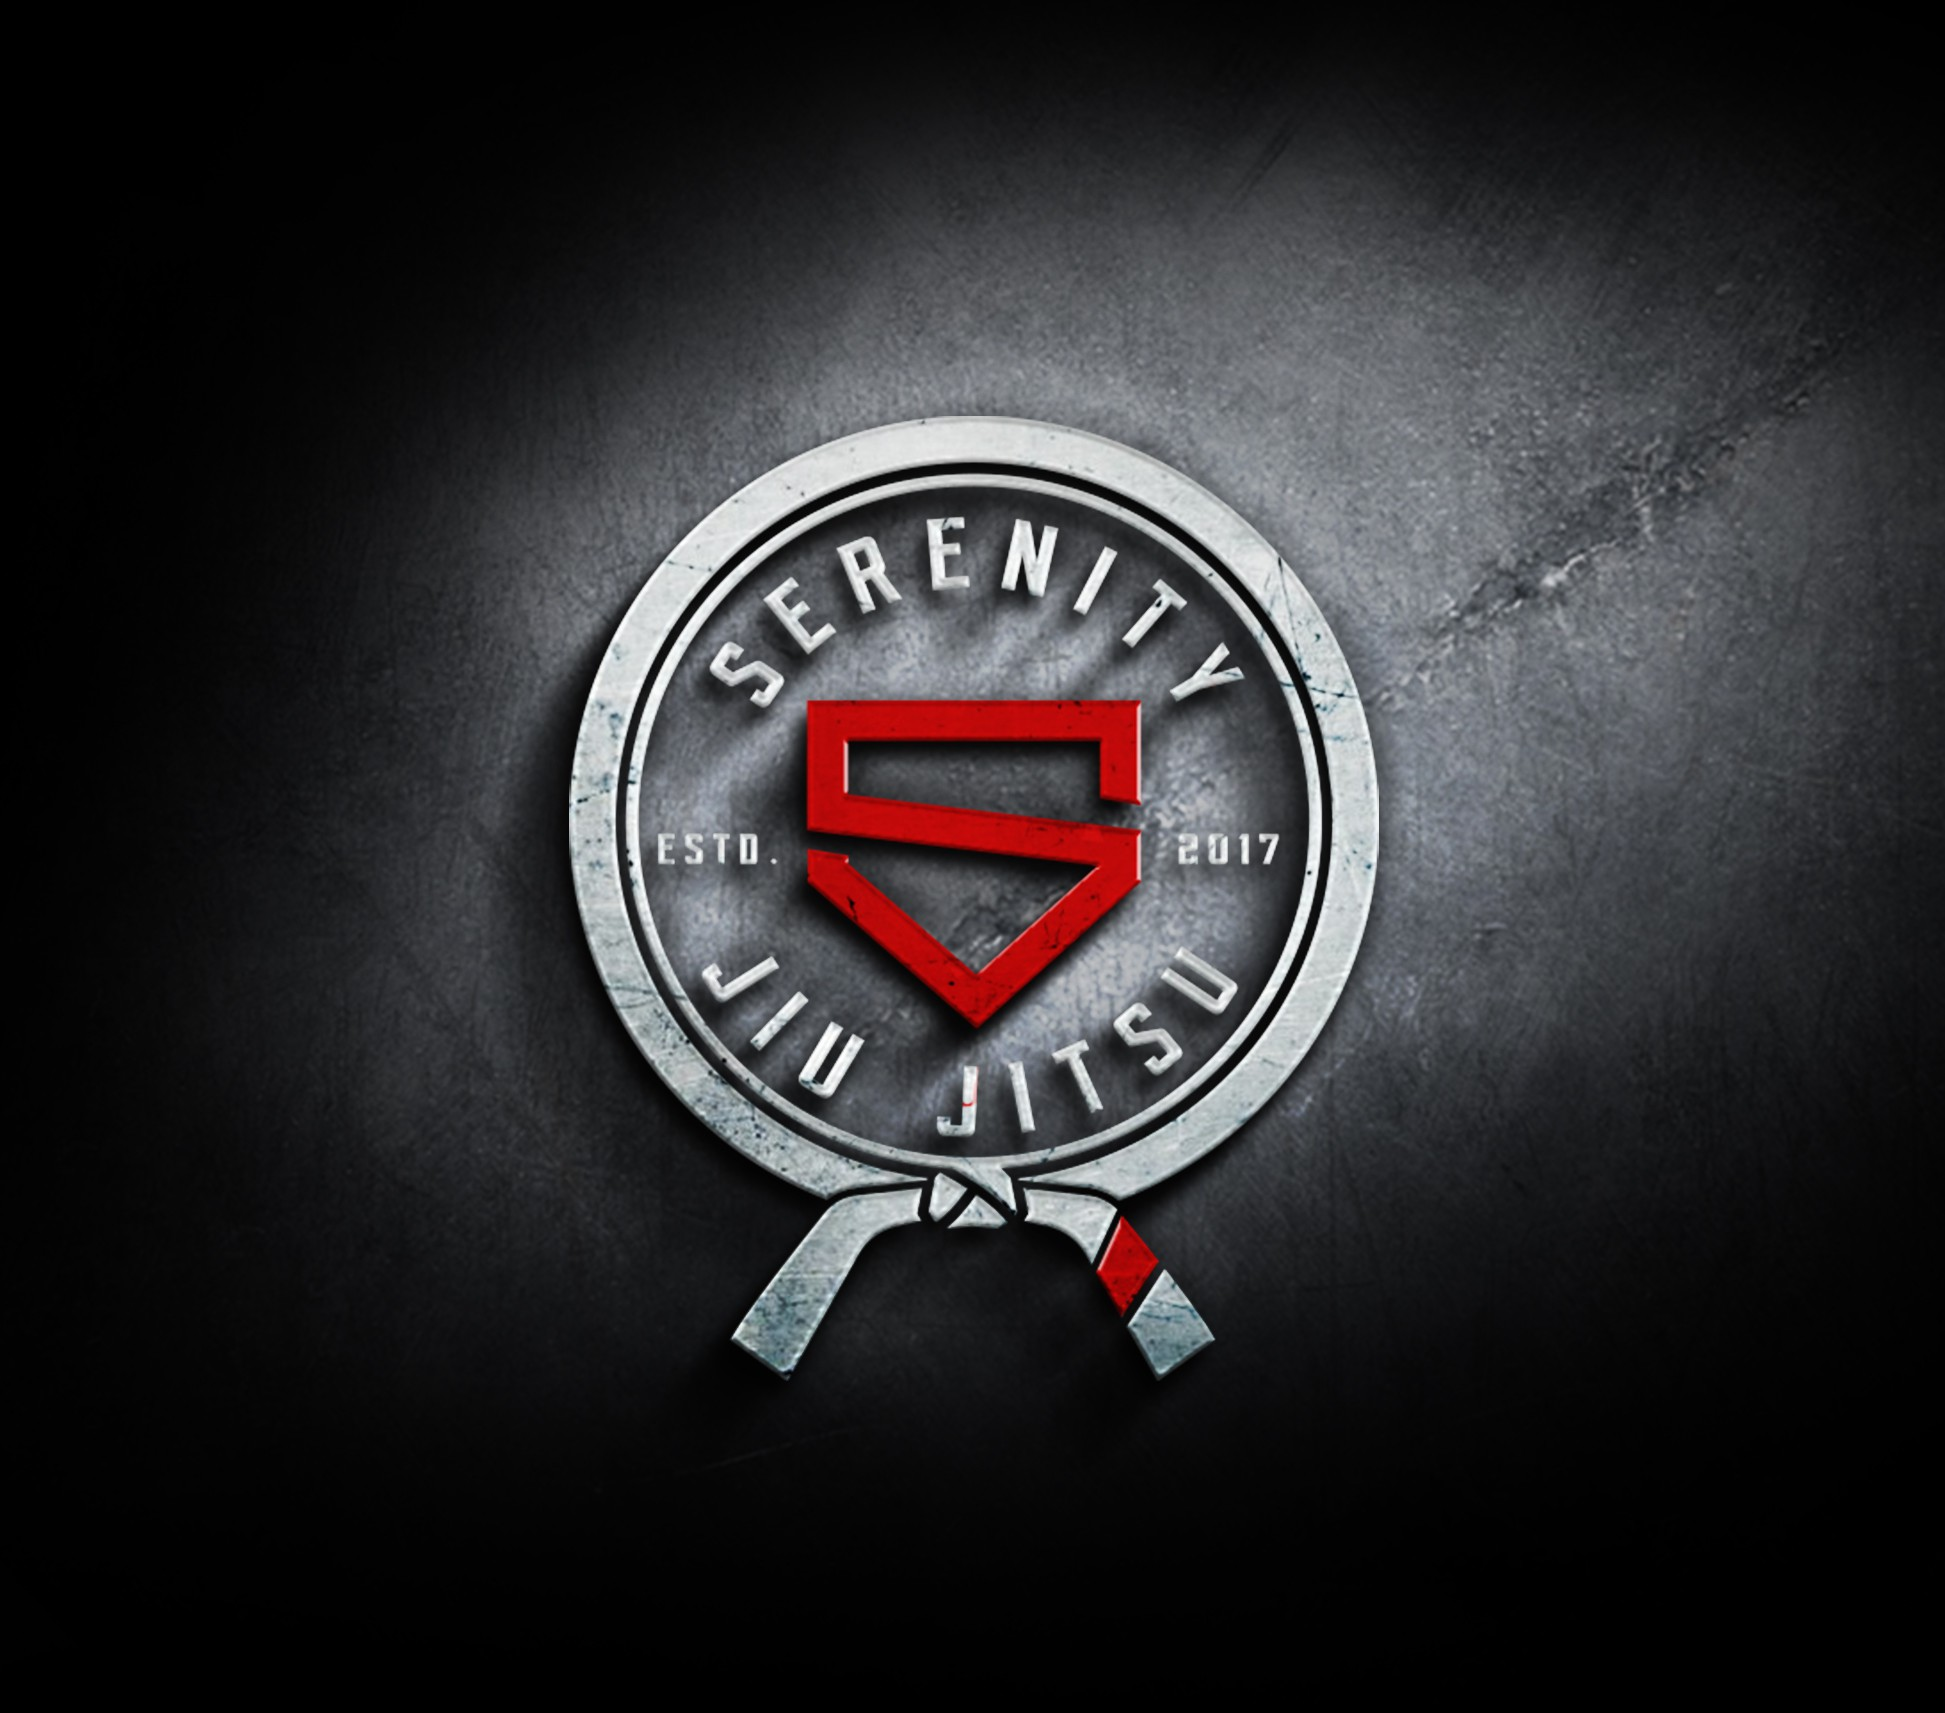 Jiu jitsu gym needs a clean new logo